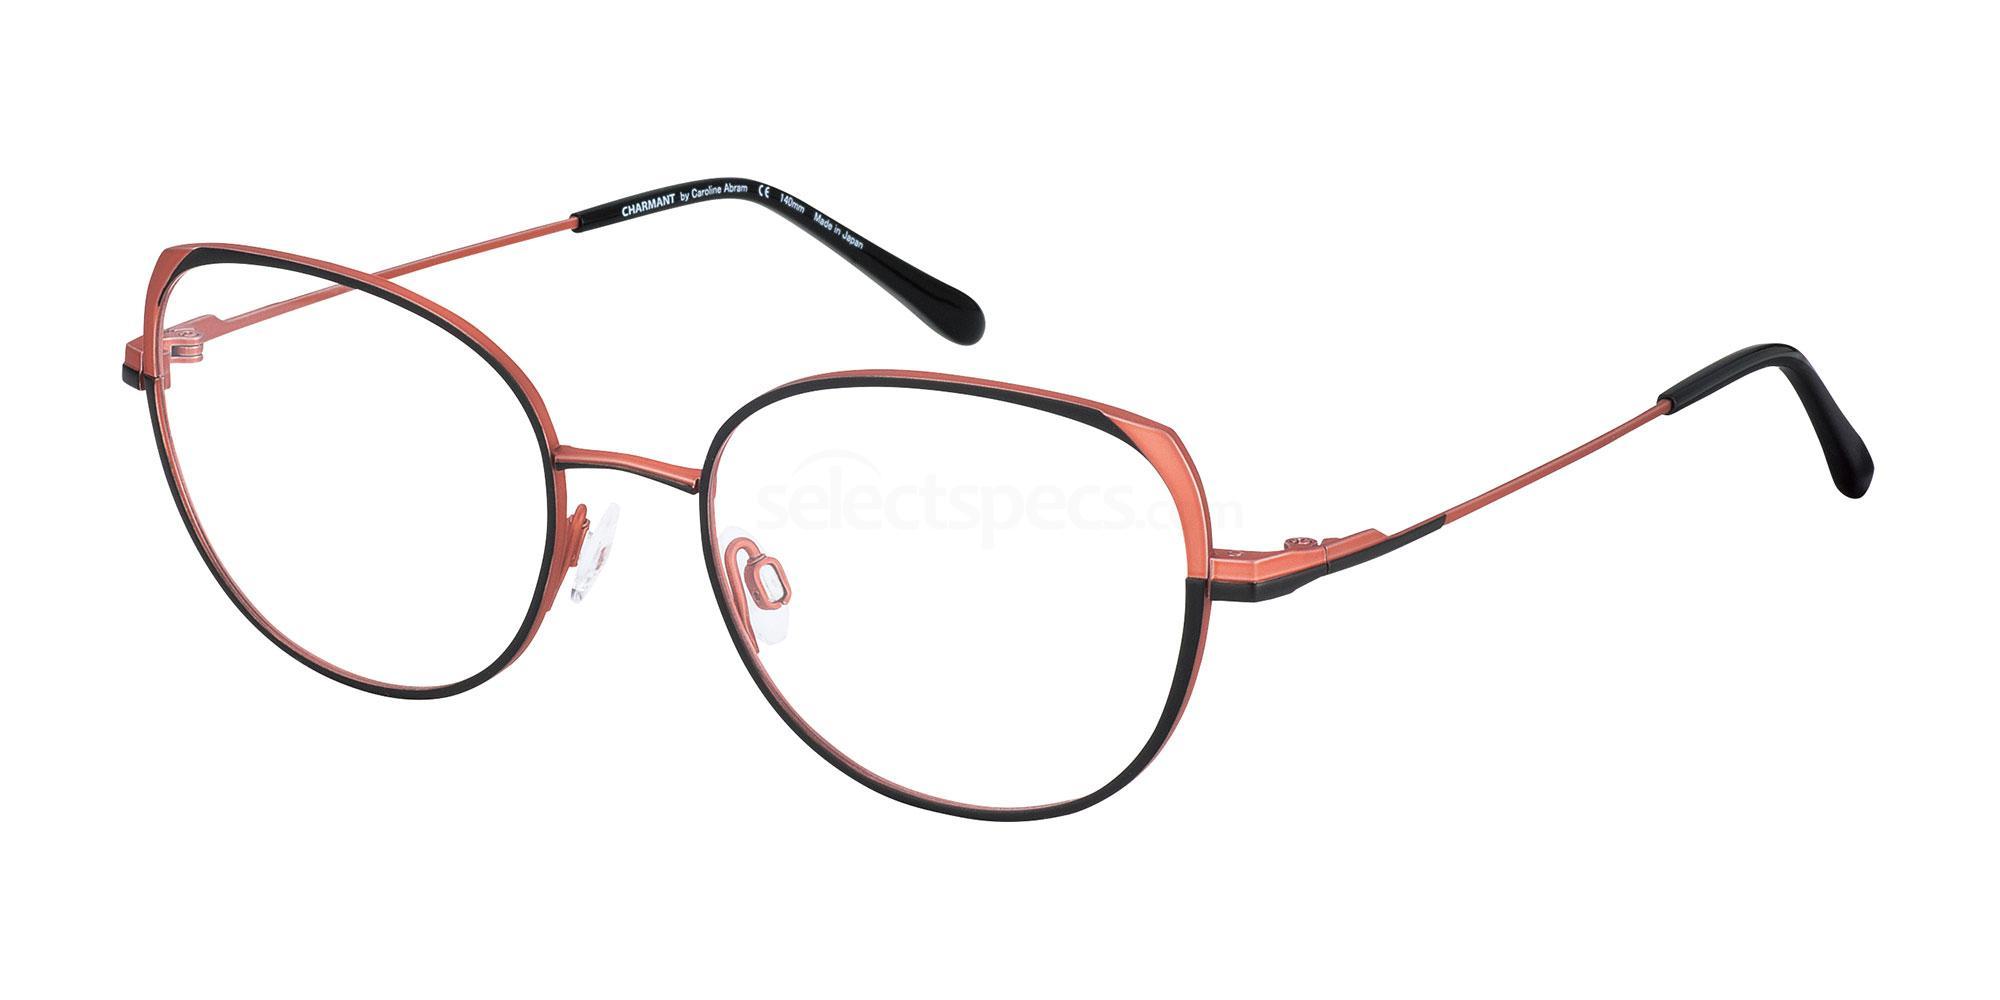 BK CH12569 Glasses, CHARMANT by Caroline Abram